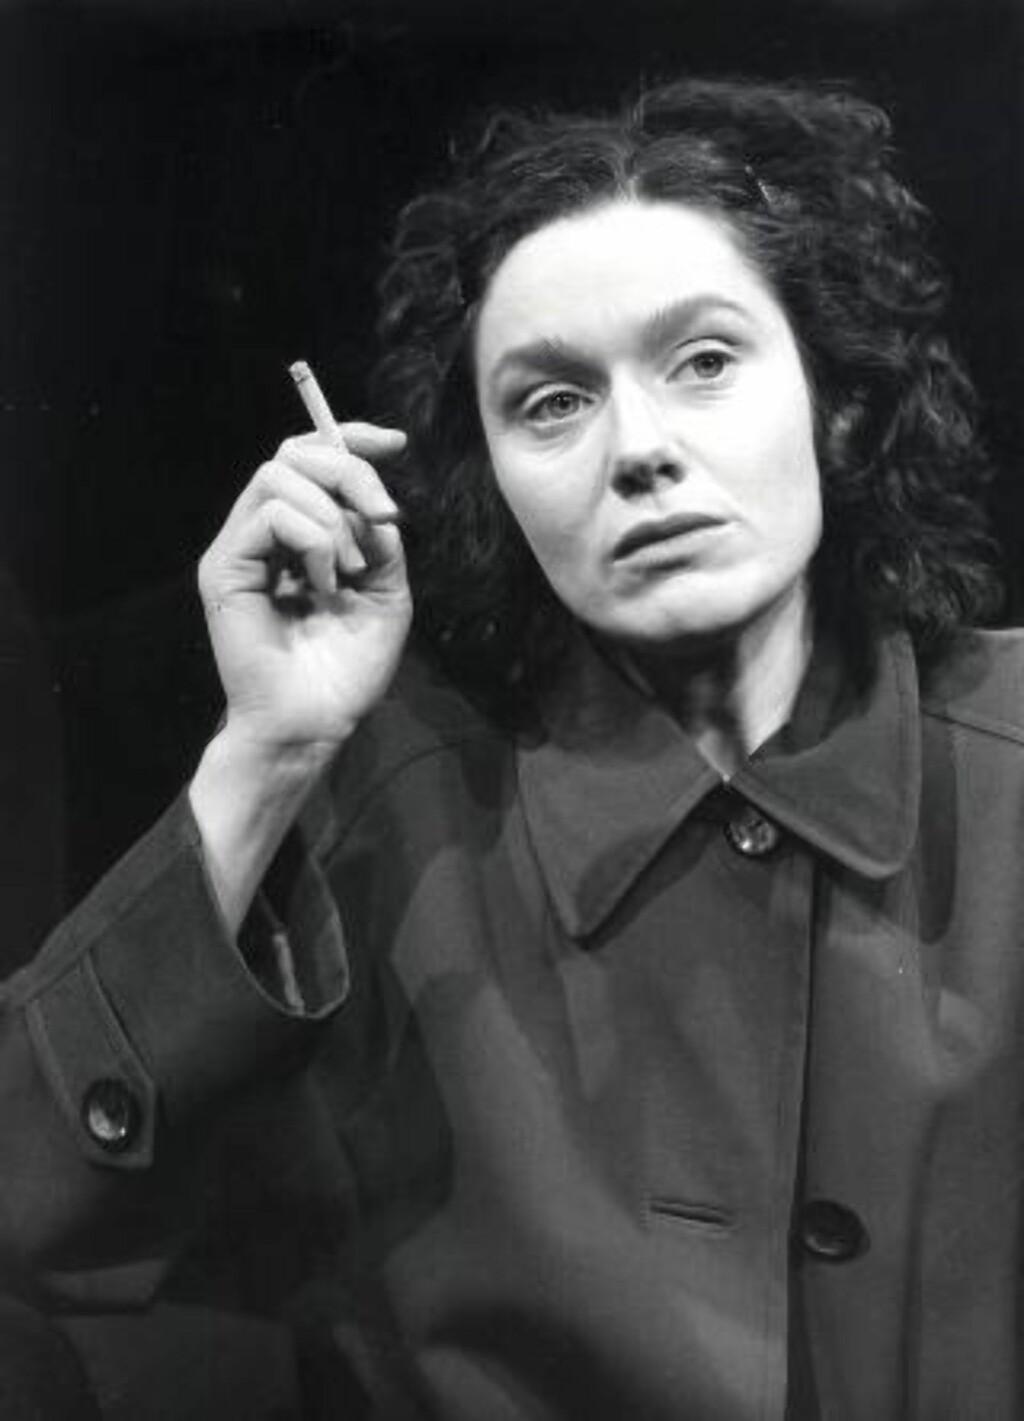 FØRSTE GANG: Ragnhild Hilt spilte «Av måneskin gror det ingenting» som 37-åring i 1982. Foto: Frits Solvang, Det Norske Teatret